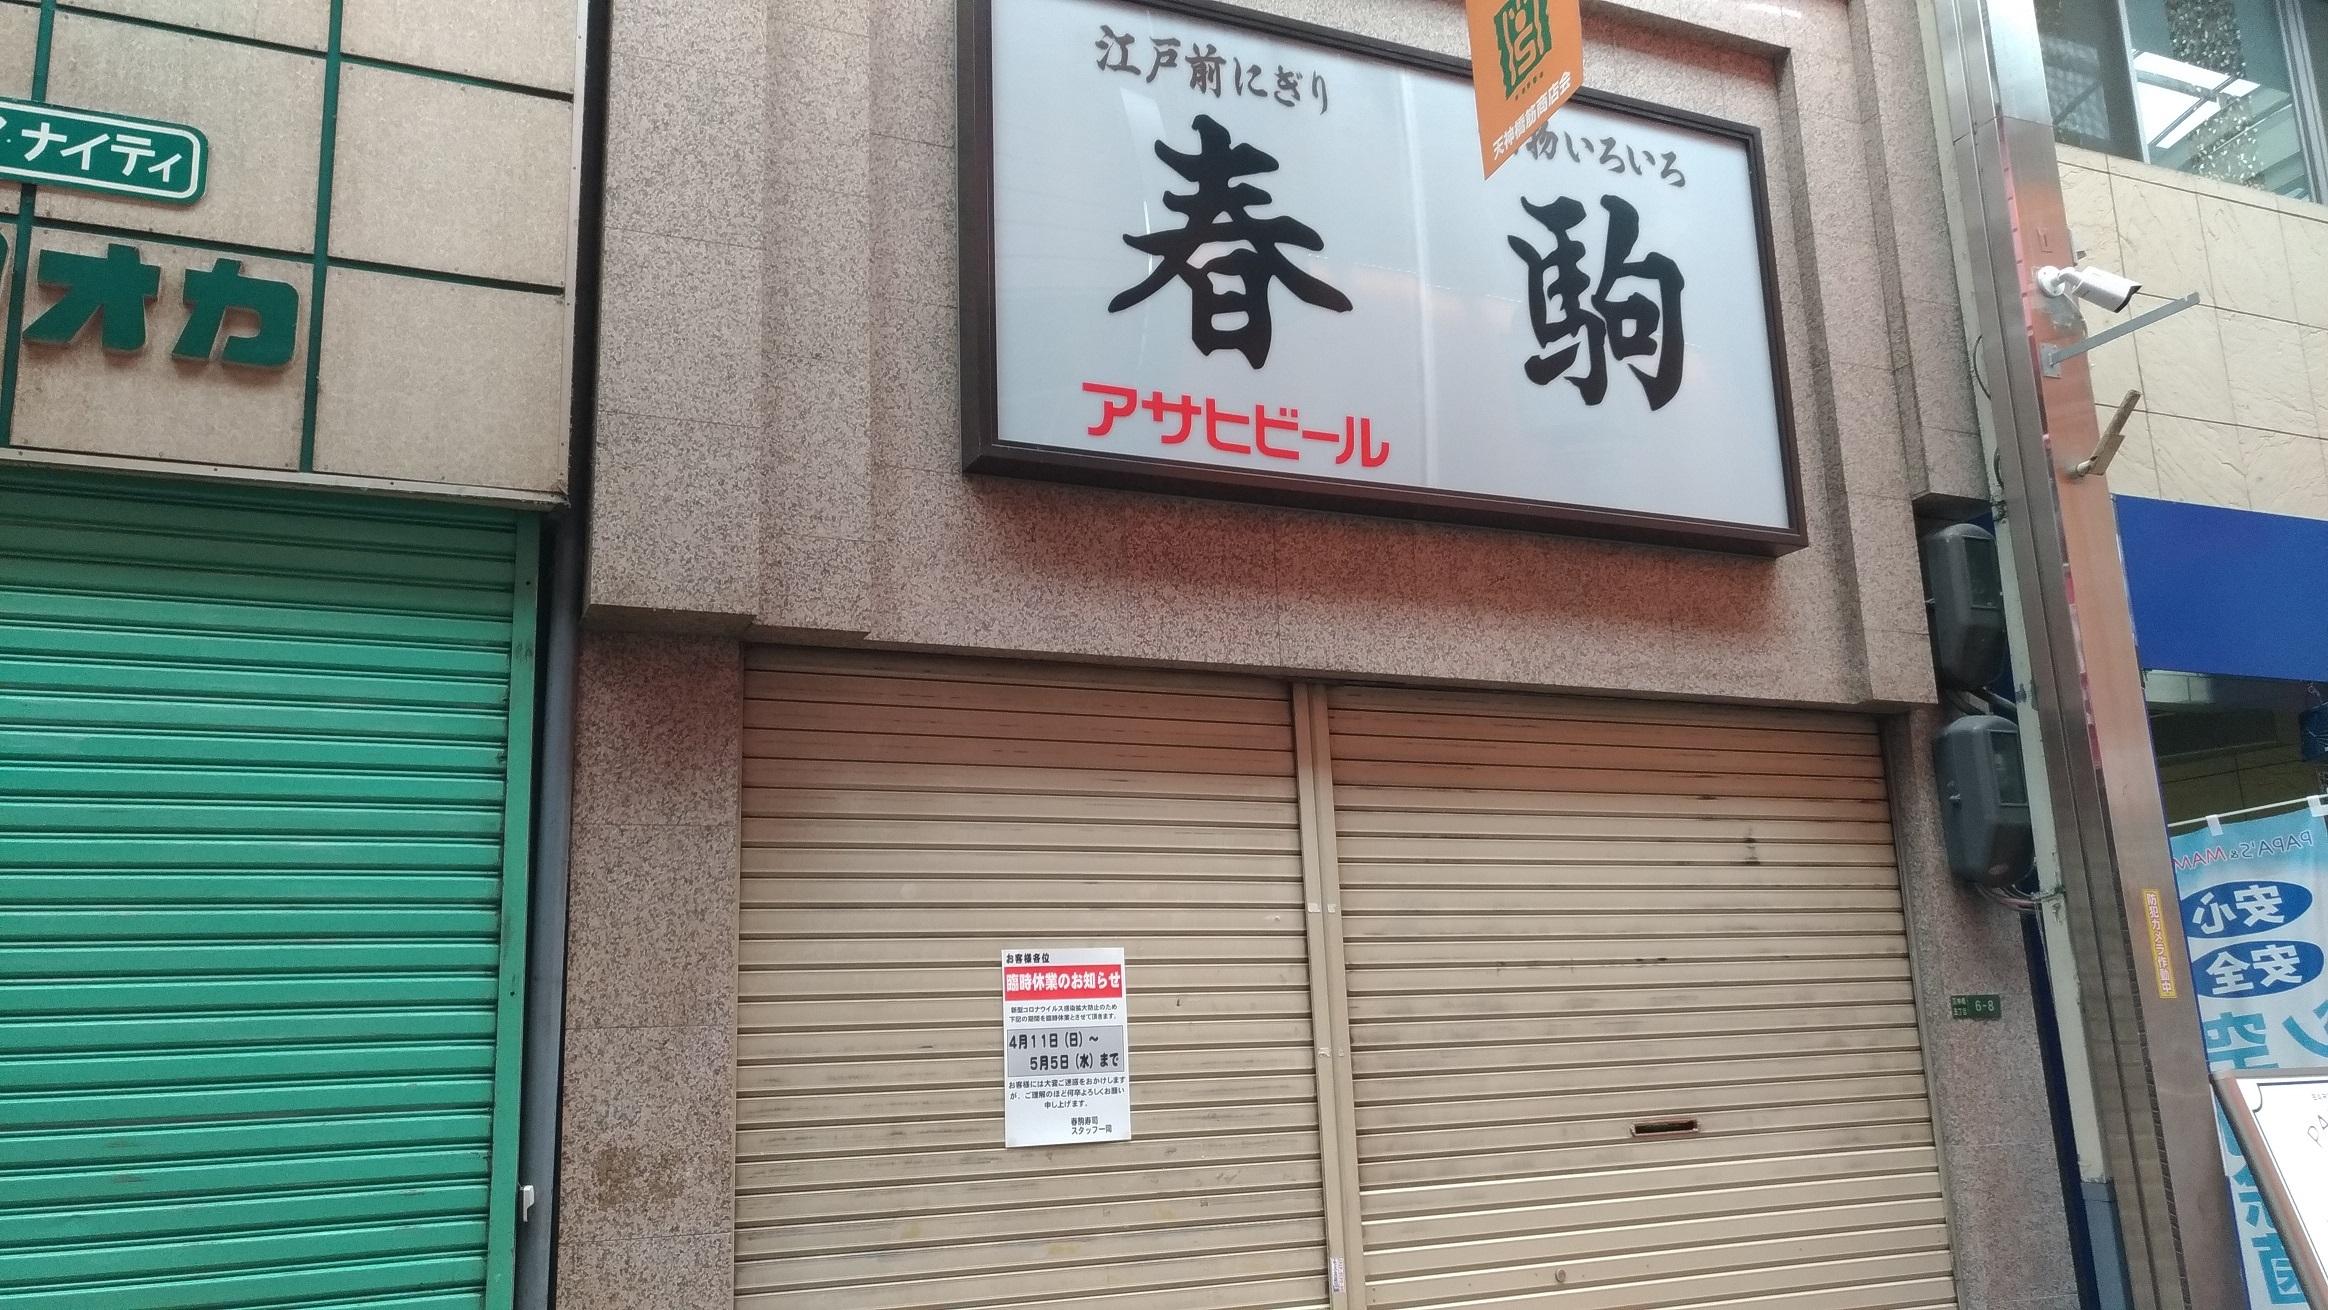 harukoma_sushi_tenma_0423_2021_1.jpg